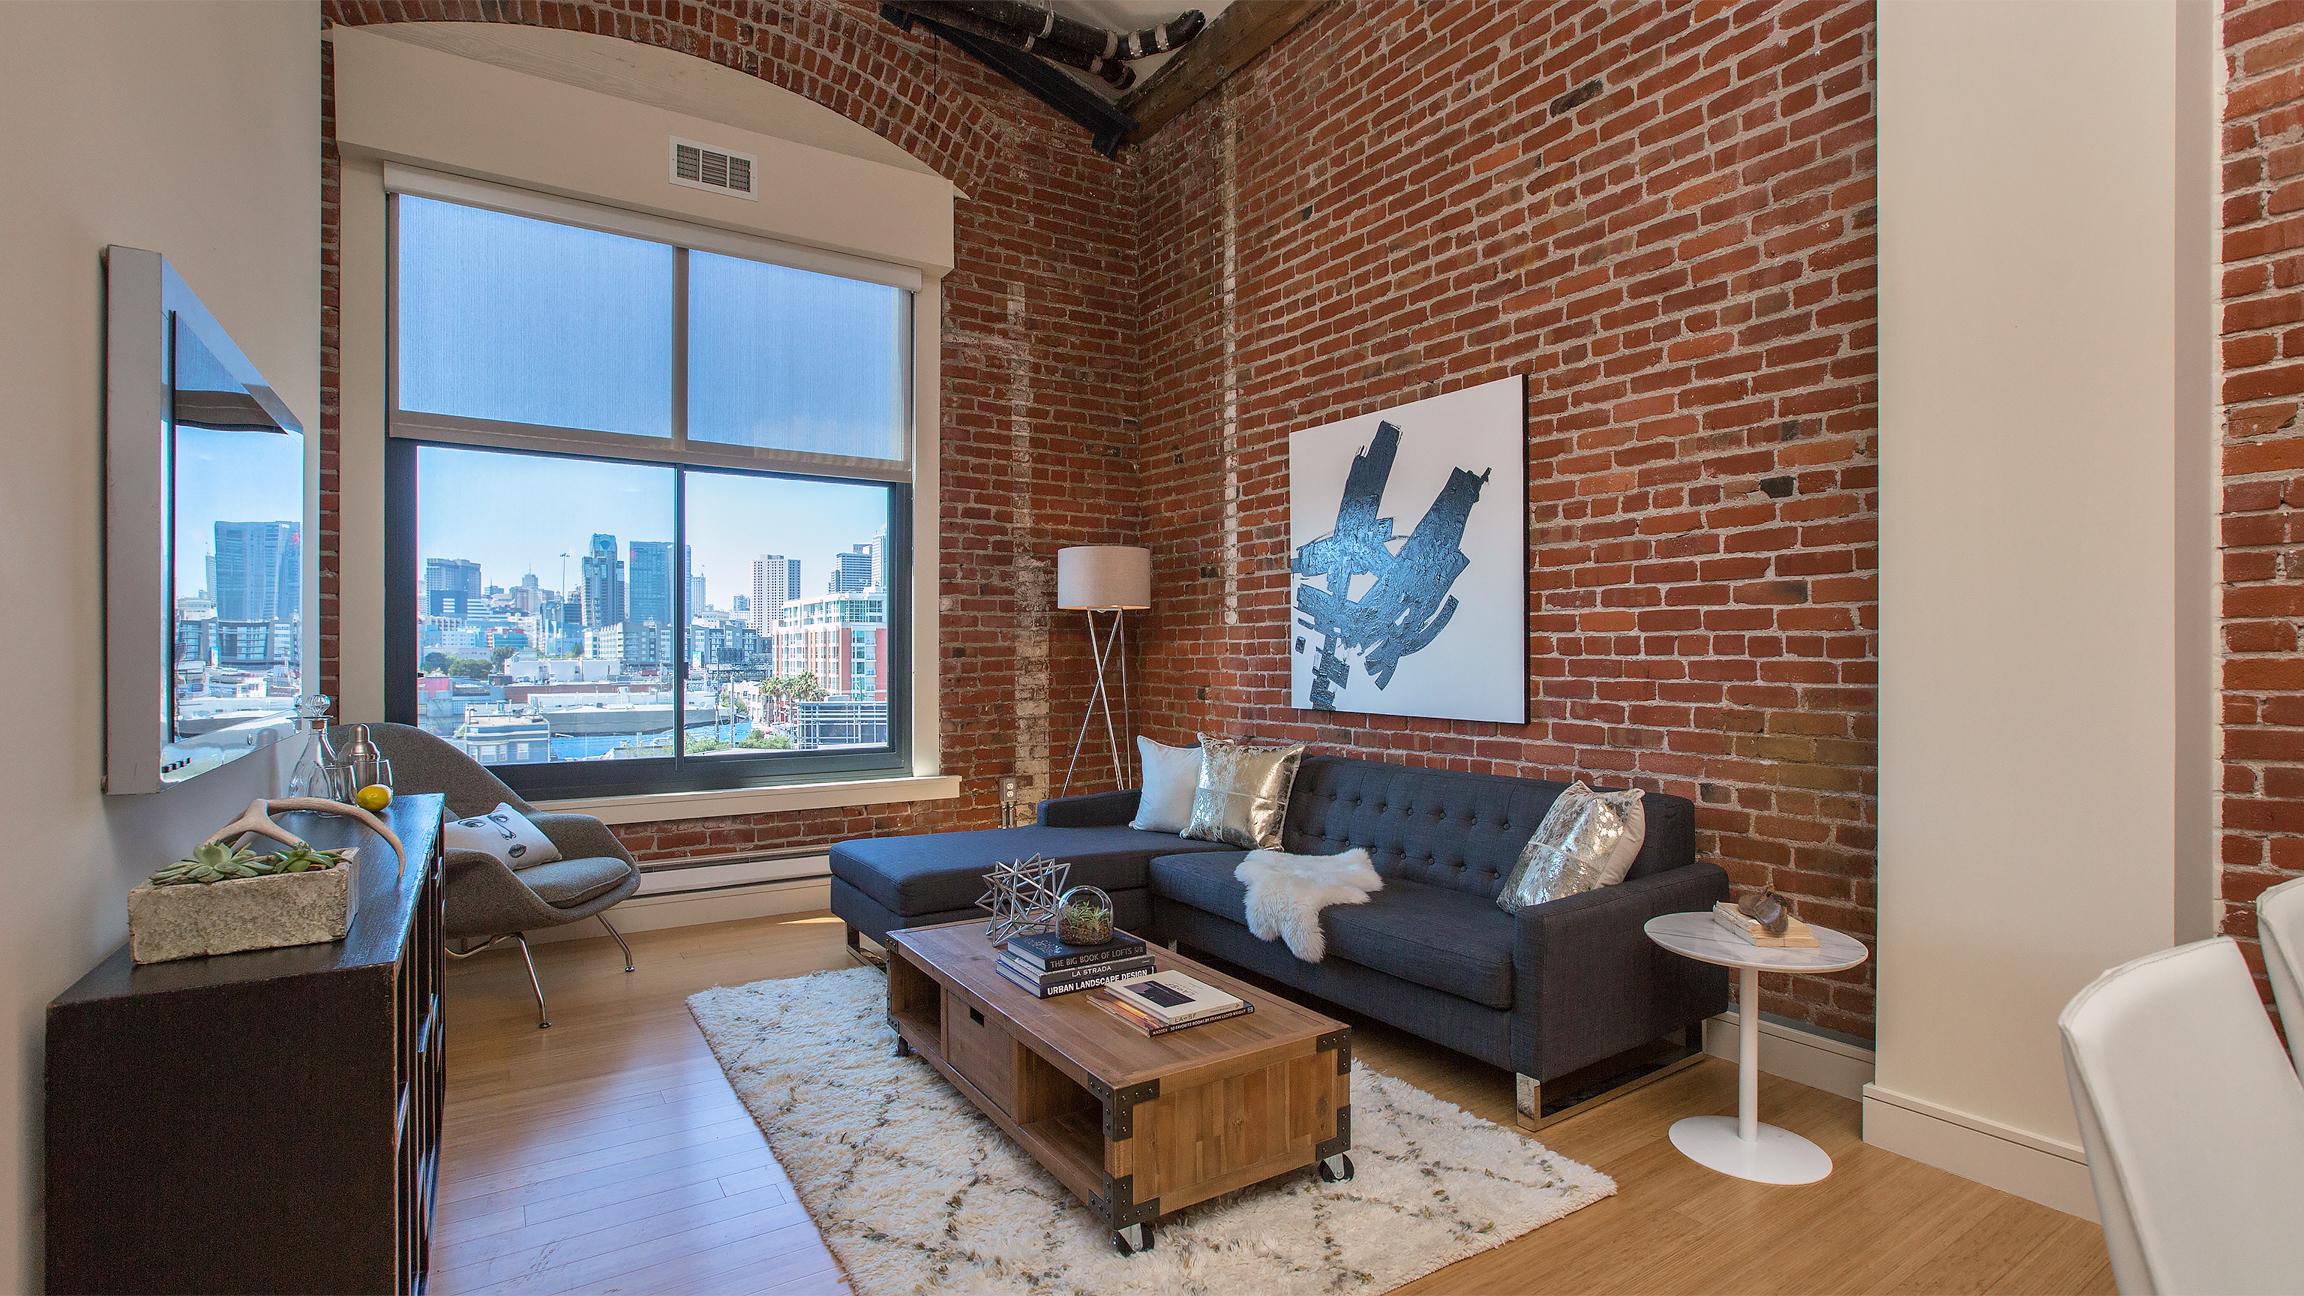 $1,010,000 - Seller310 Townsend Street #411, San Francisco